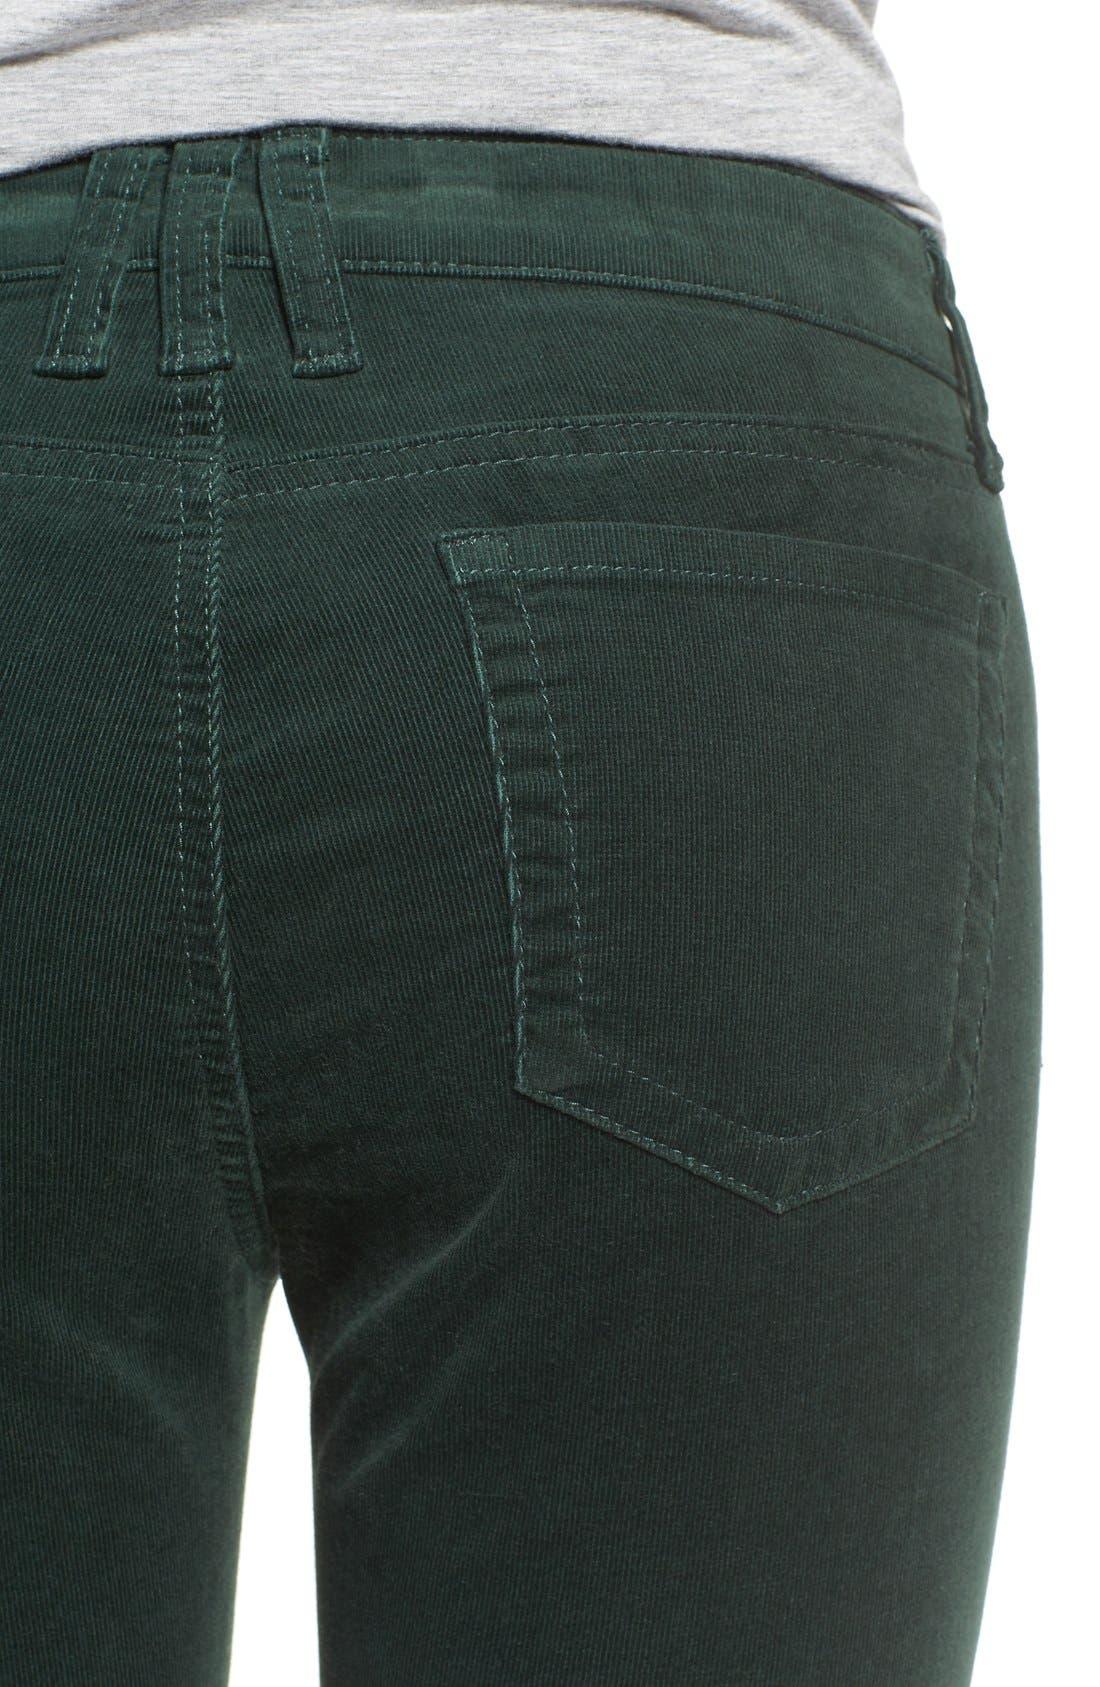 'Diana' Stretch Corduroy Skinny Pants,                             Alternate thumbnail 131, color,